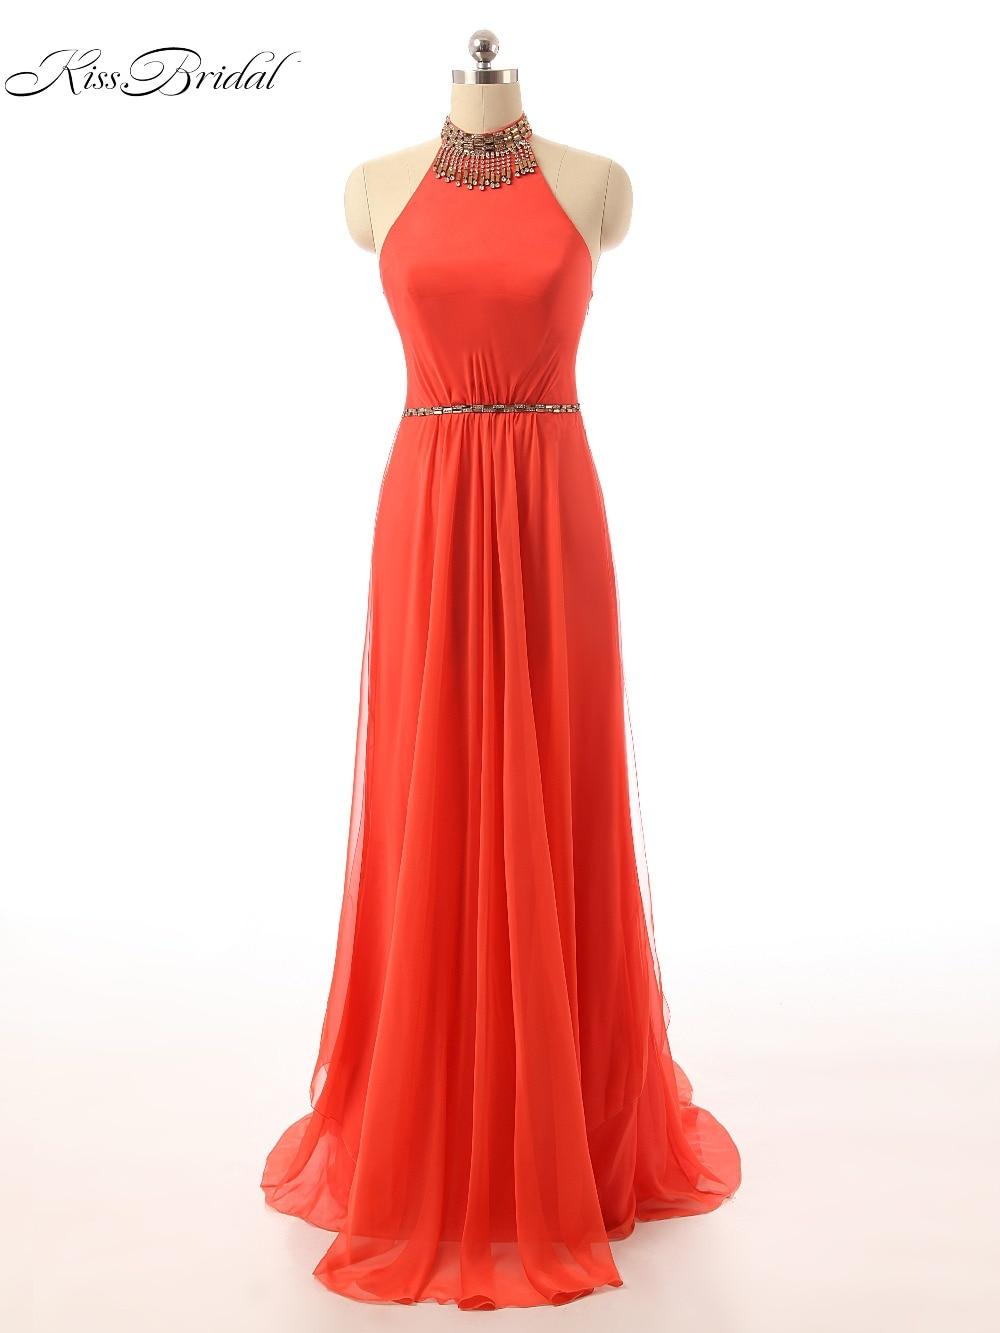 Long Elegant   Prom     Dresses   2017 Sexy Vestidos De Festa Beads Halter Neck Sleeveless A-Line Formal Evening Party Gowns